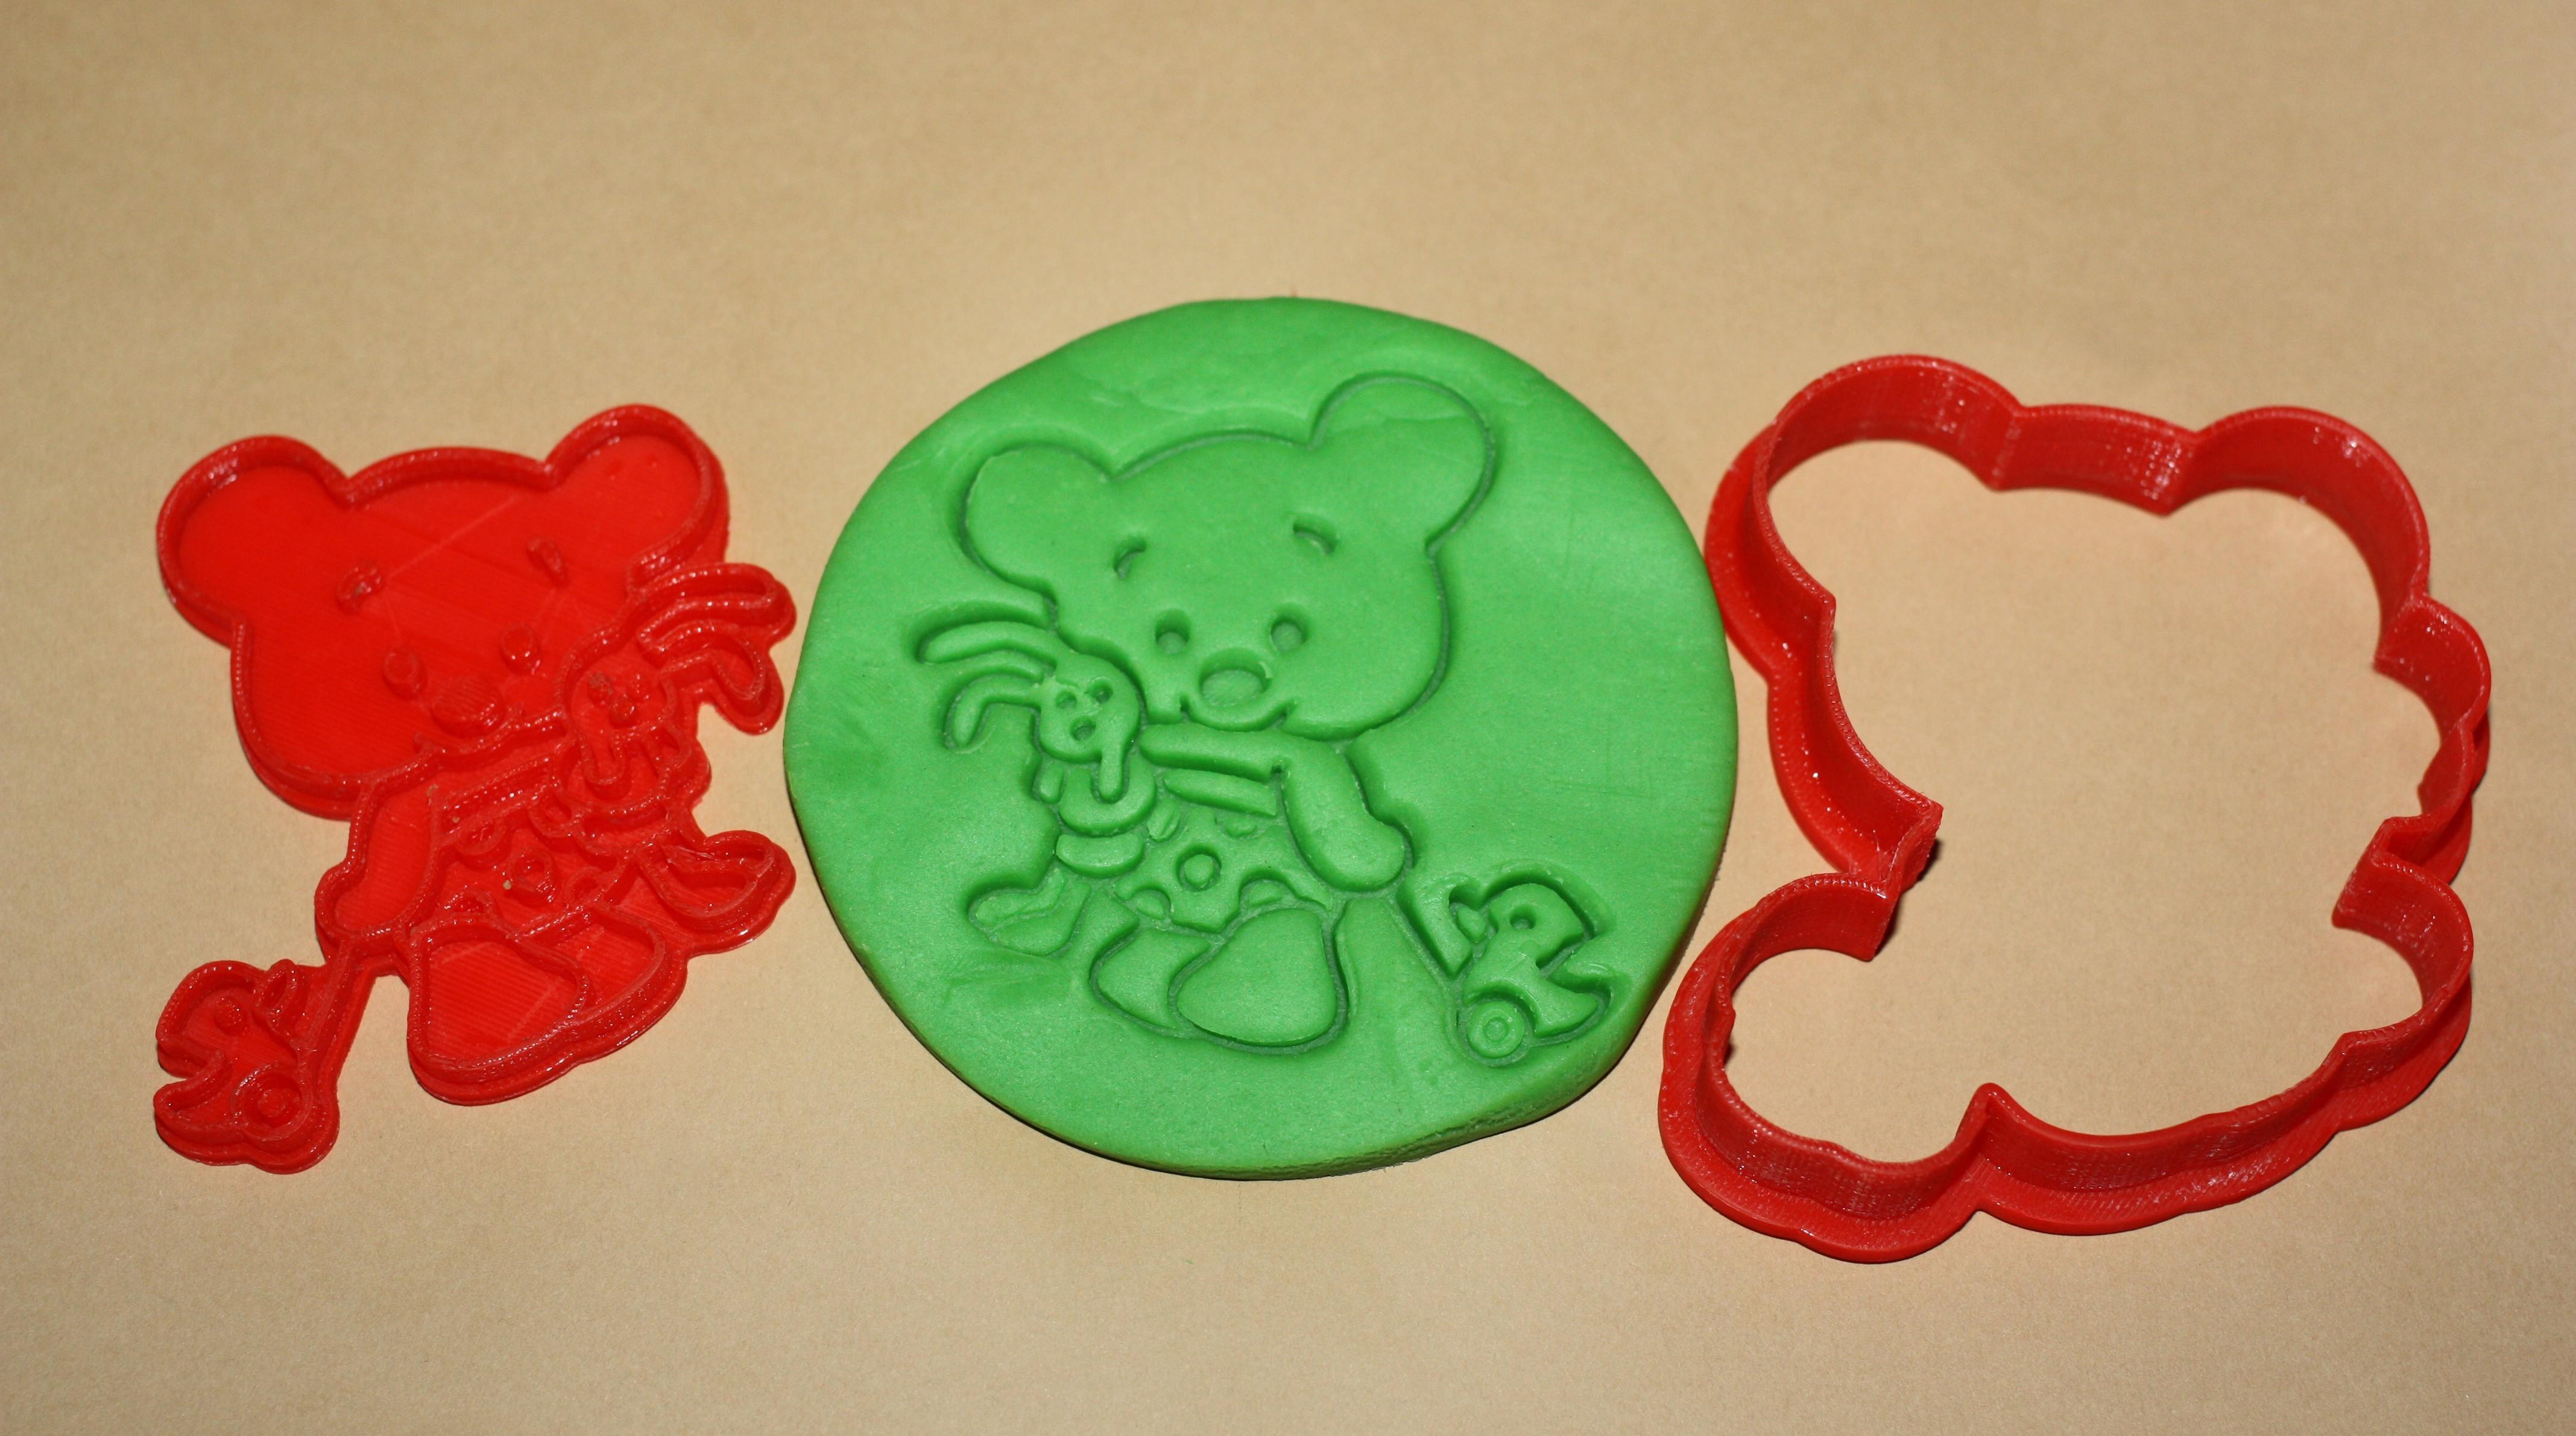 СuteBear1.jpg Download STL file Сute Bear with toys - COOKIE CUTTER • 3D printable object, dmitriysk3d